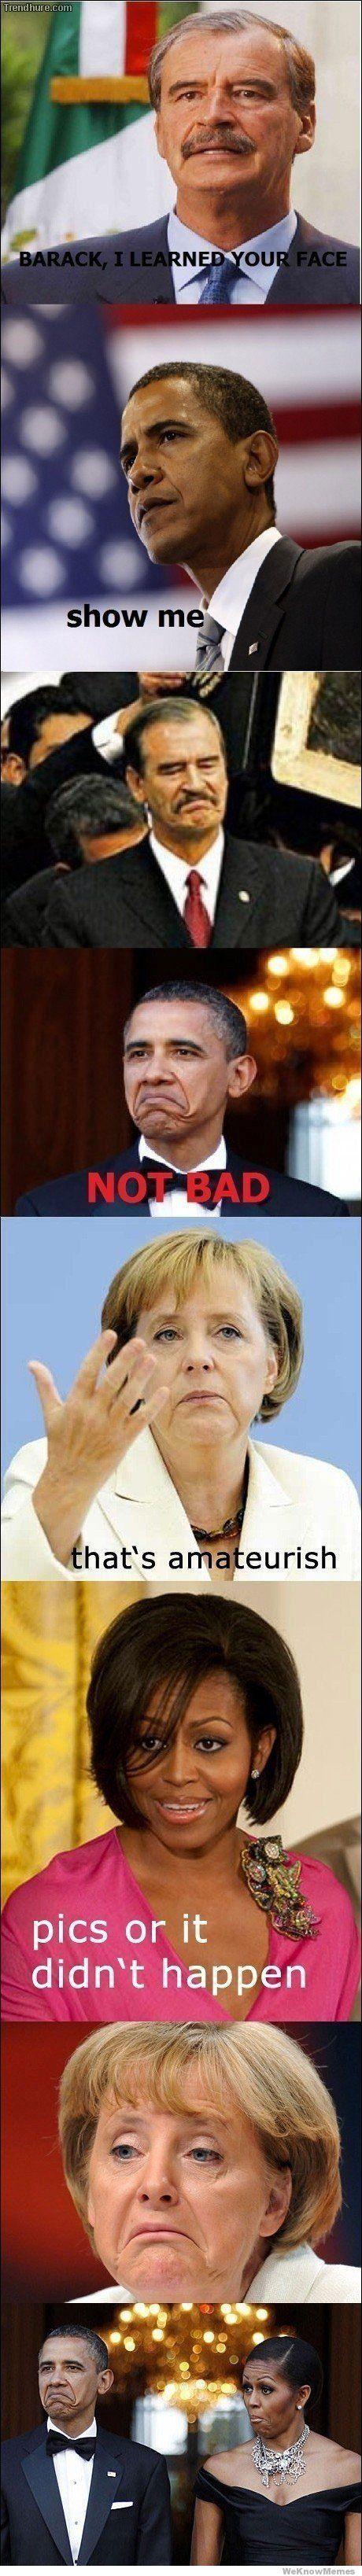 obama not bad!